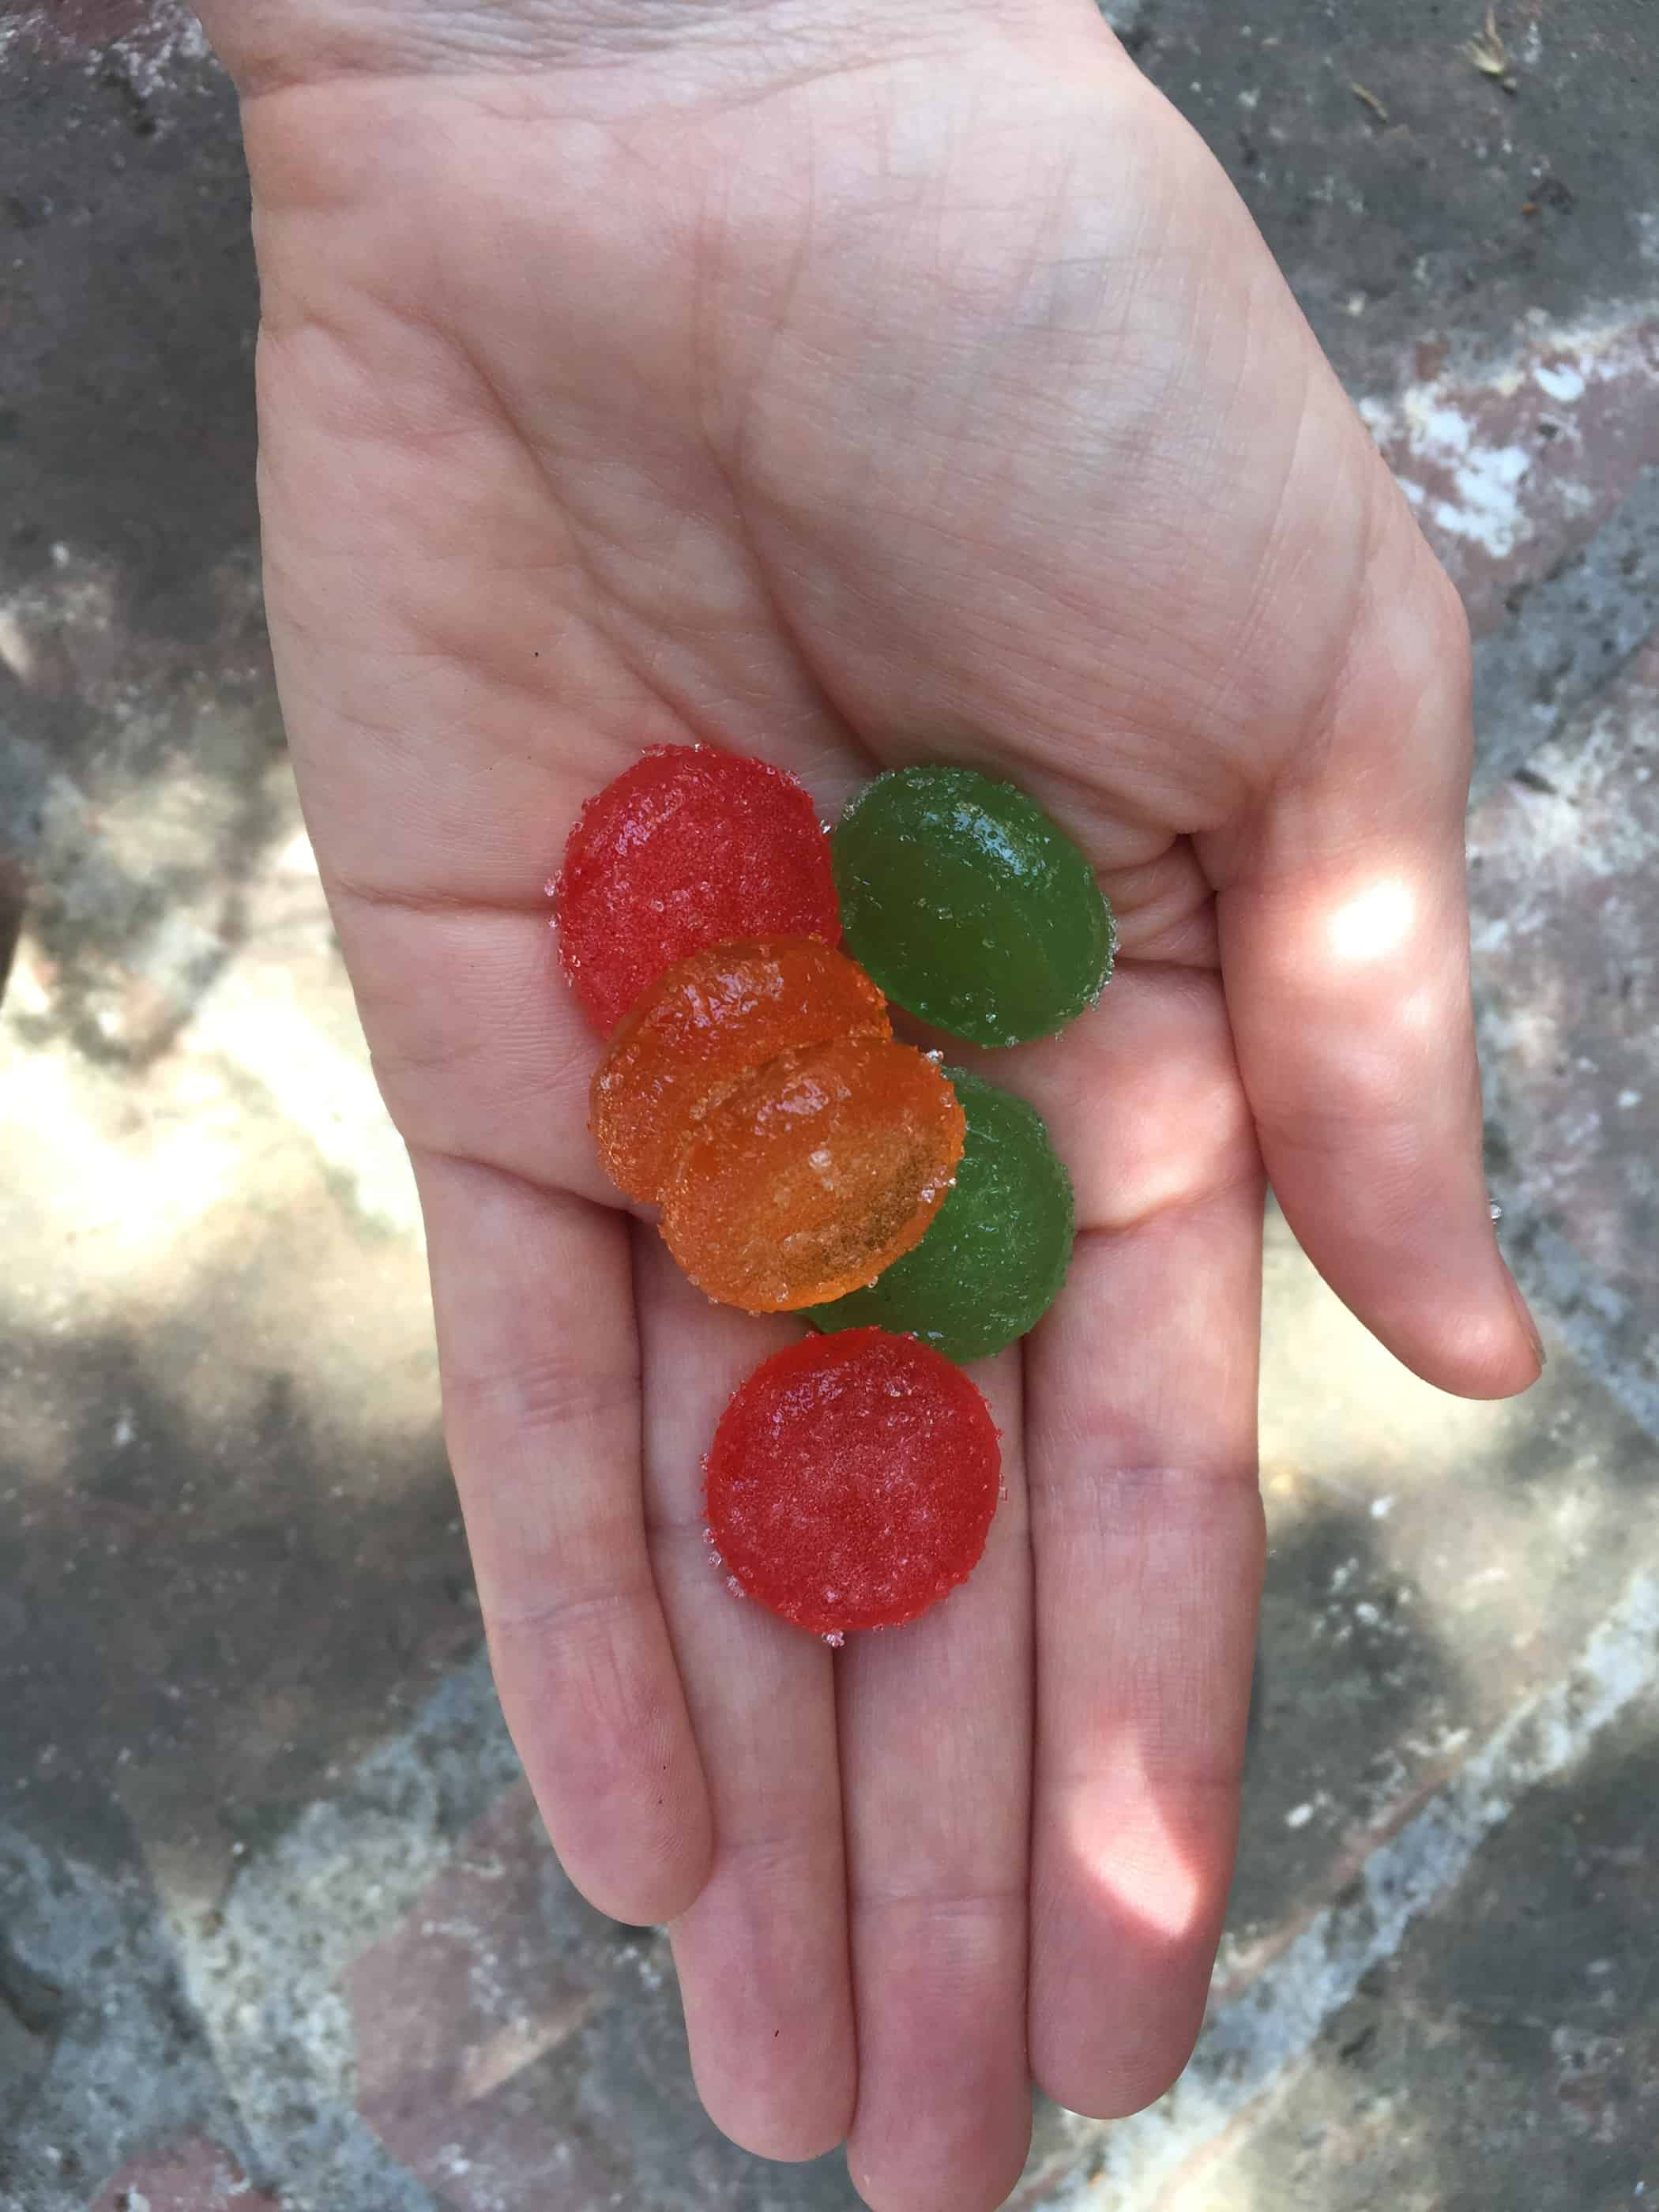 reef cbd sour gummies save on cannabis review beauty shot